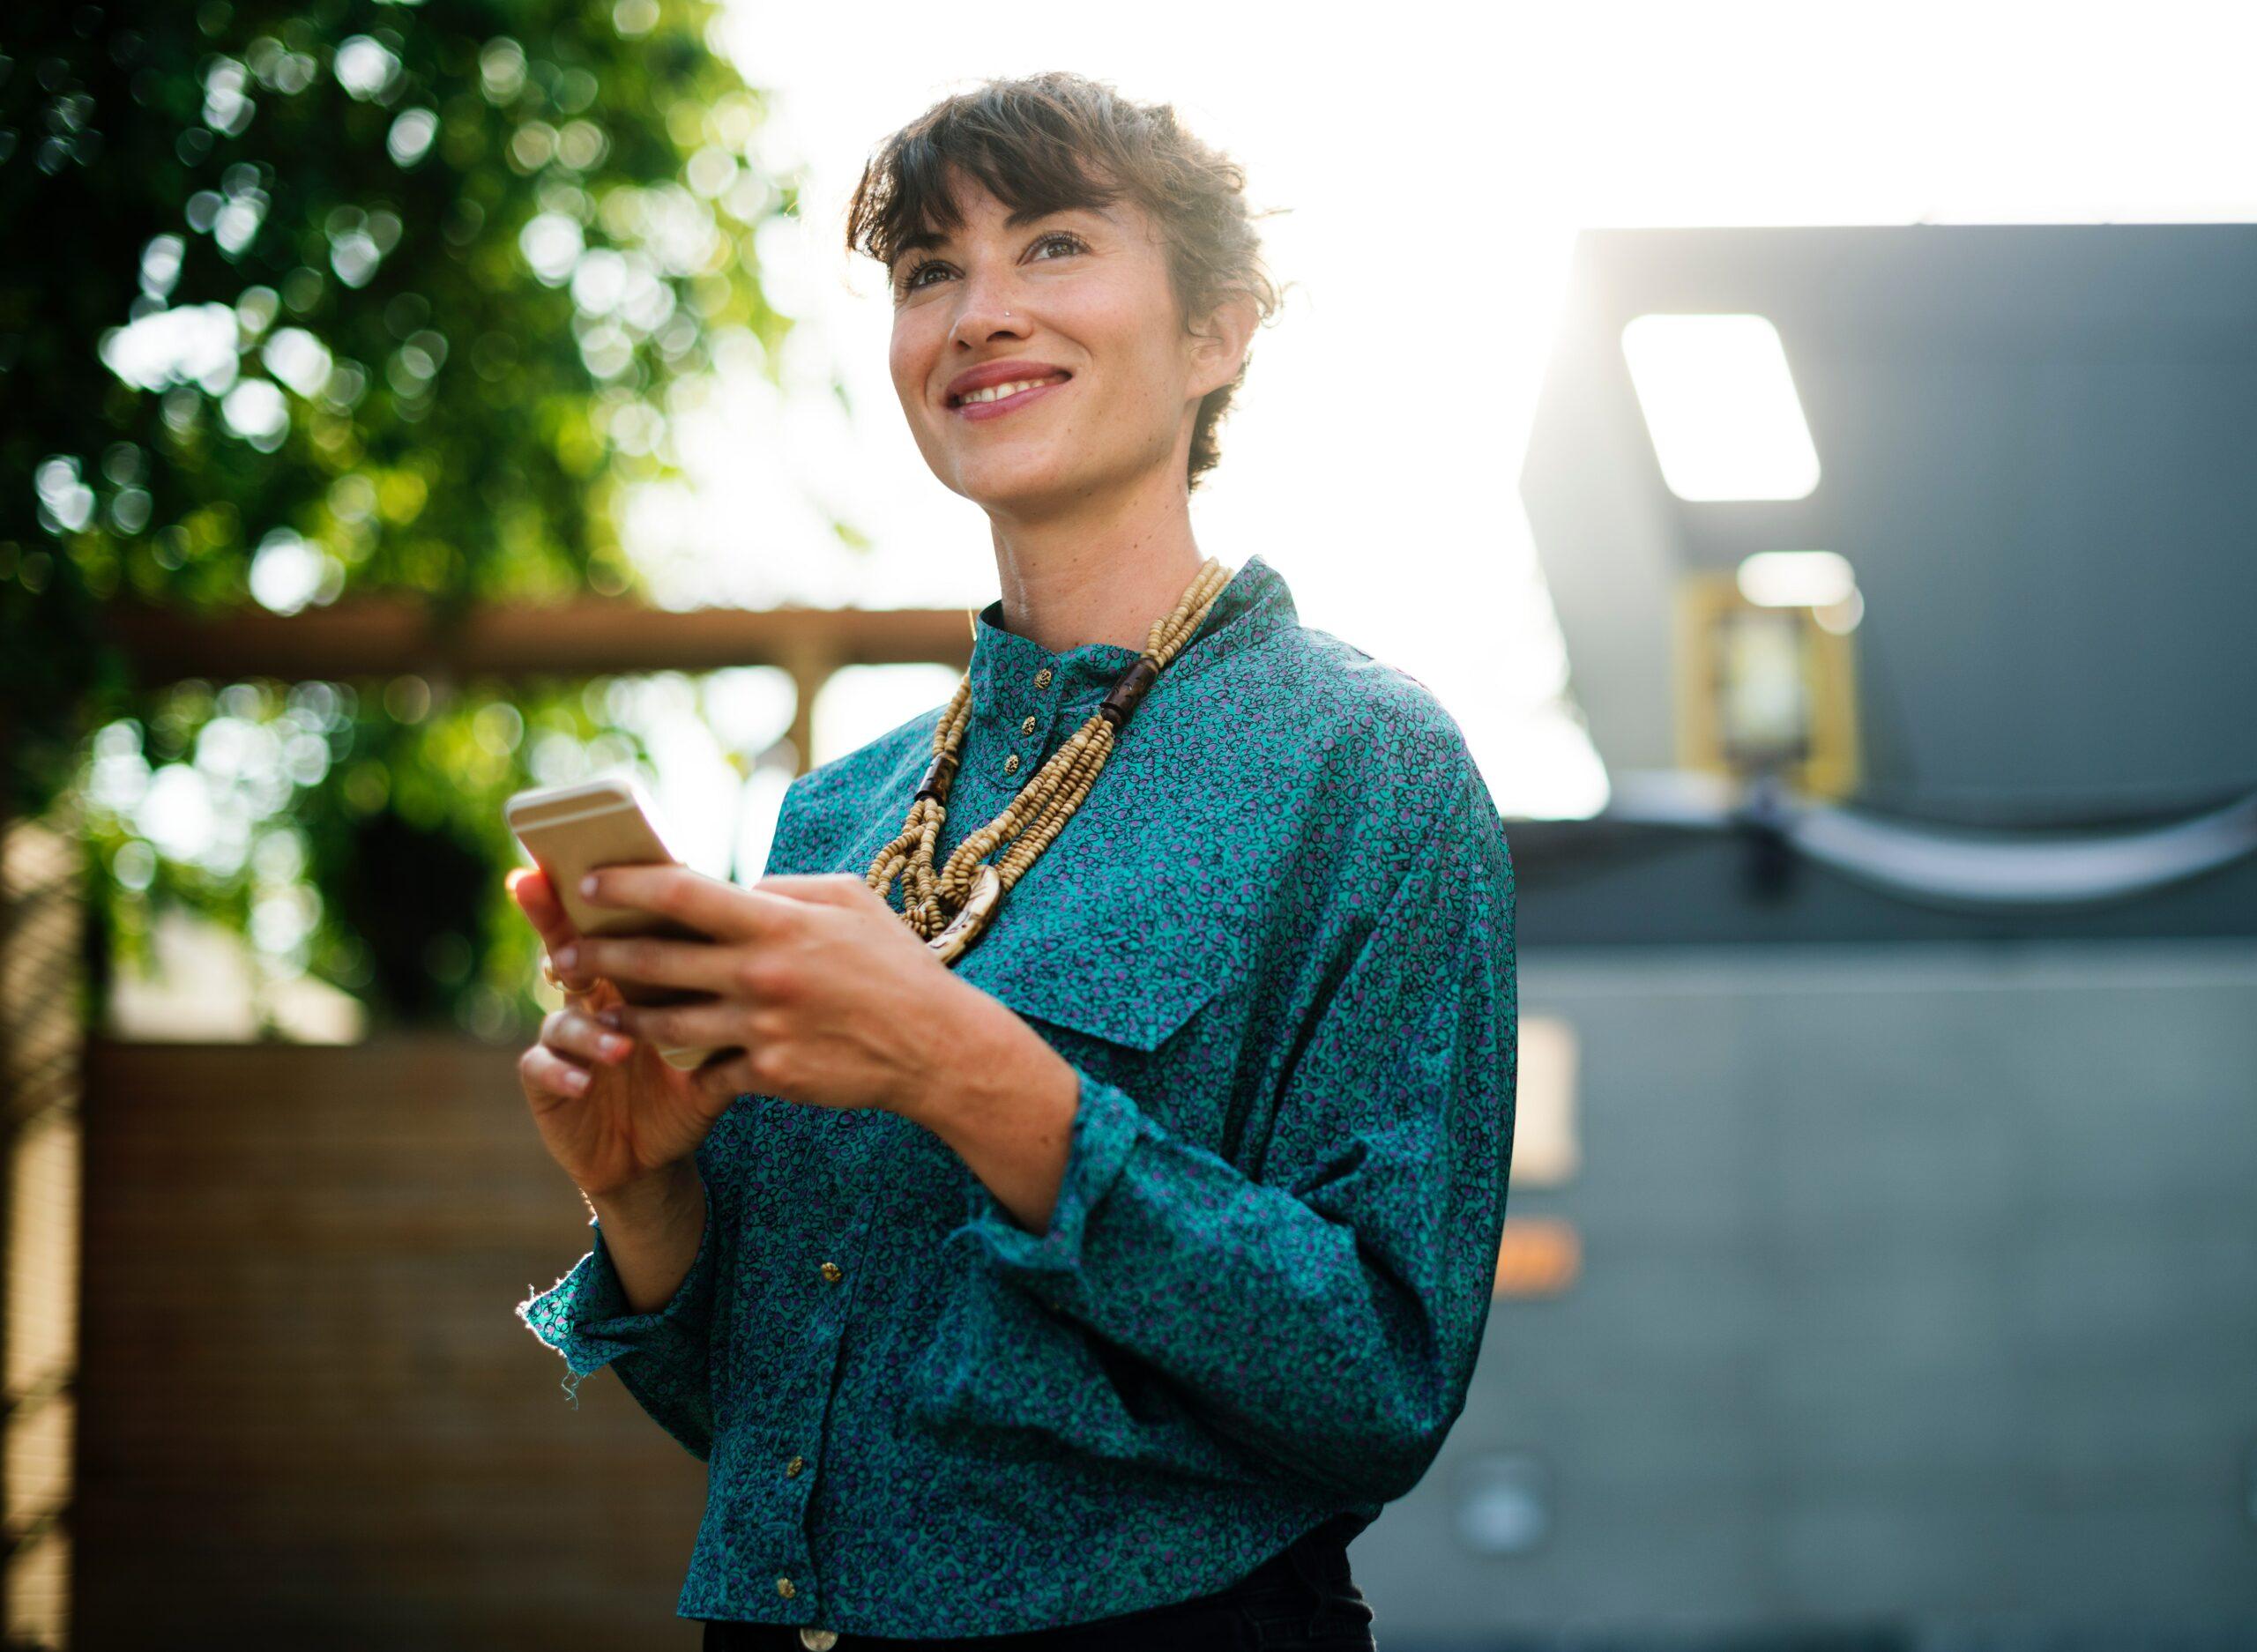 Imagebild_Businesswoman_Smartphone